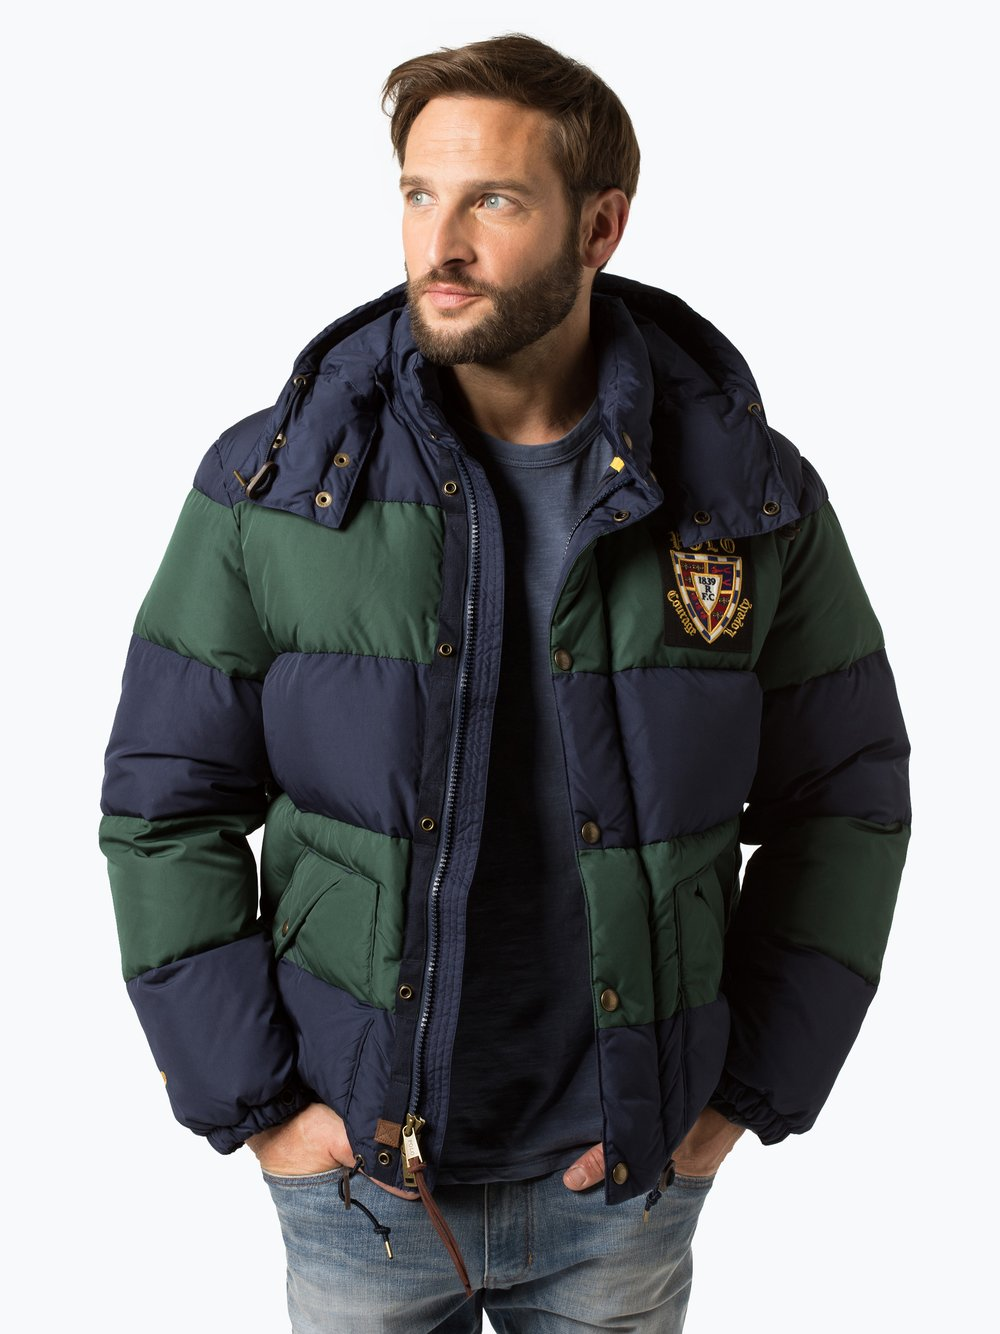 Polo Ralph Lauren Herren Daunenjacke online kaufen | PEEK